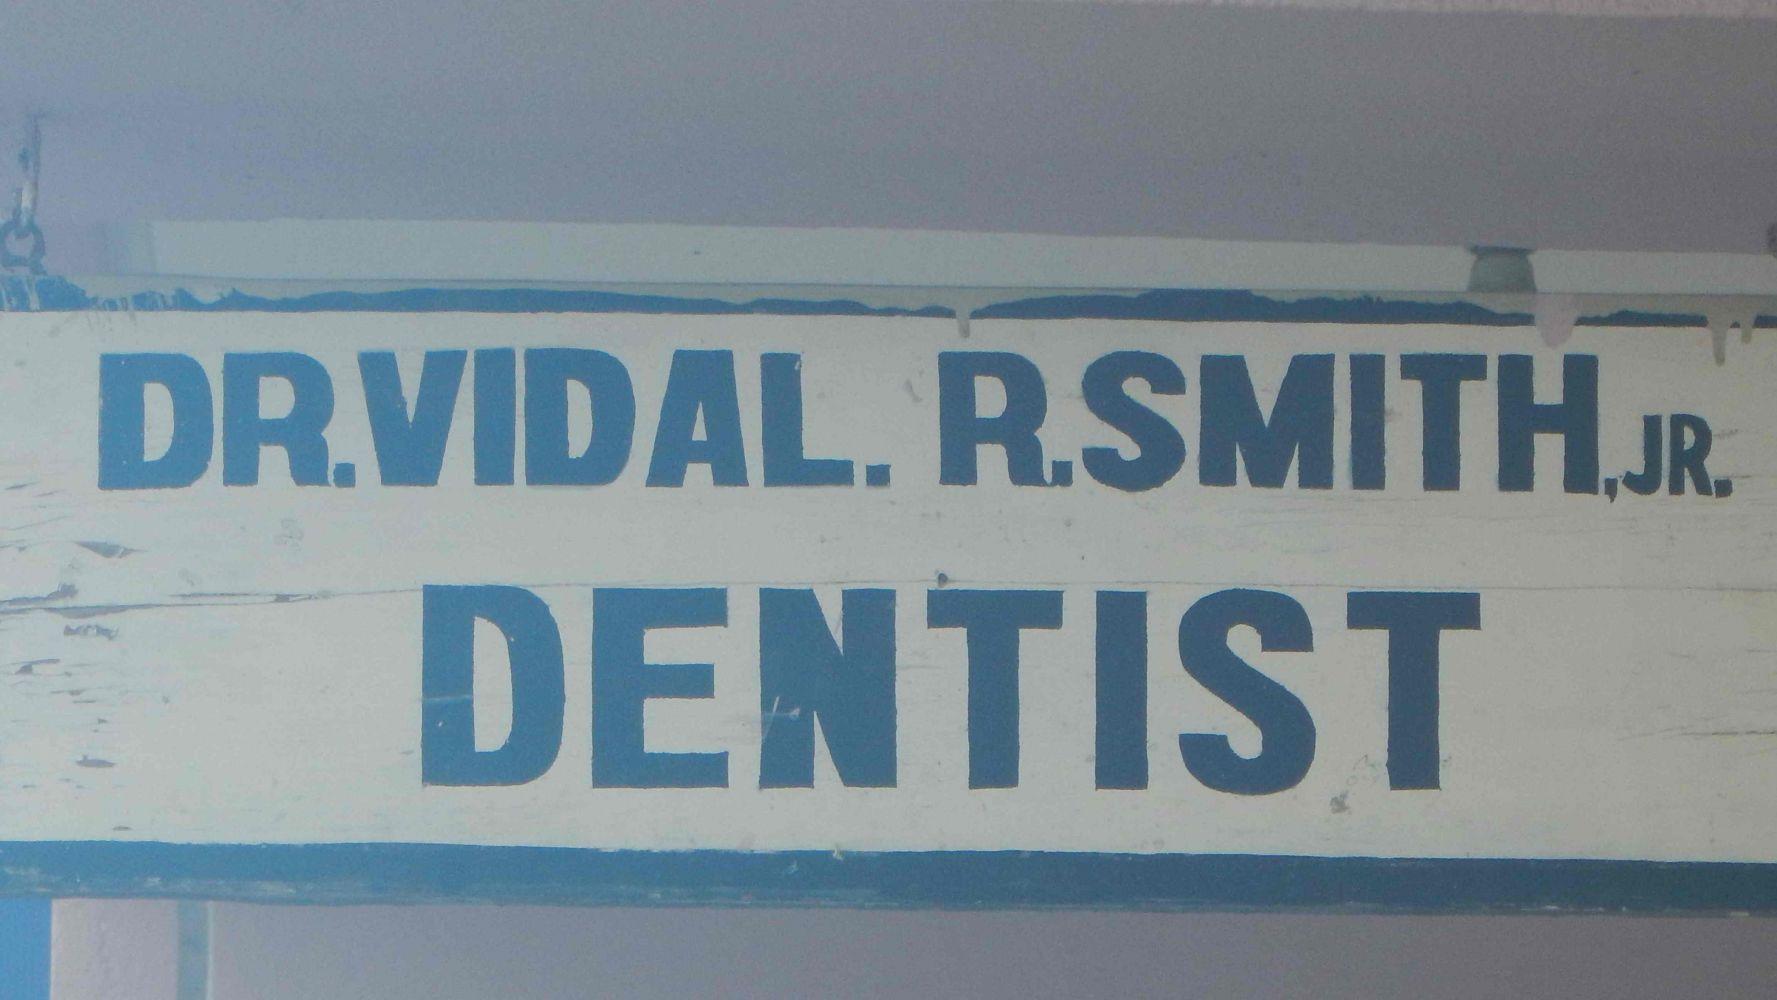 Dr. Vidal Smith Port Antonio Portland Jamaica